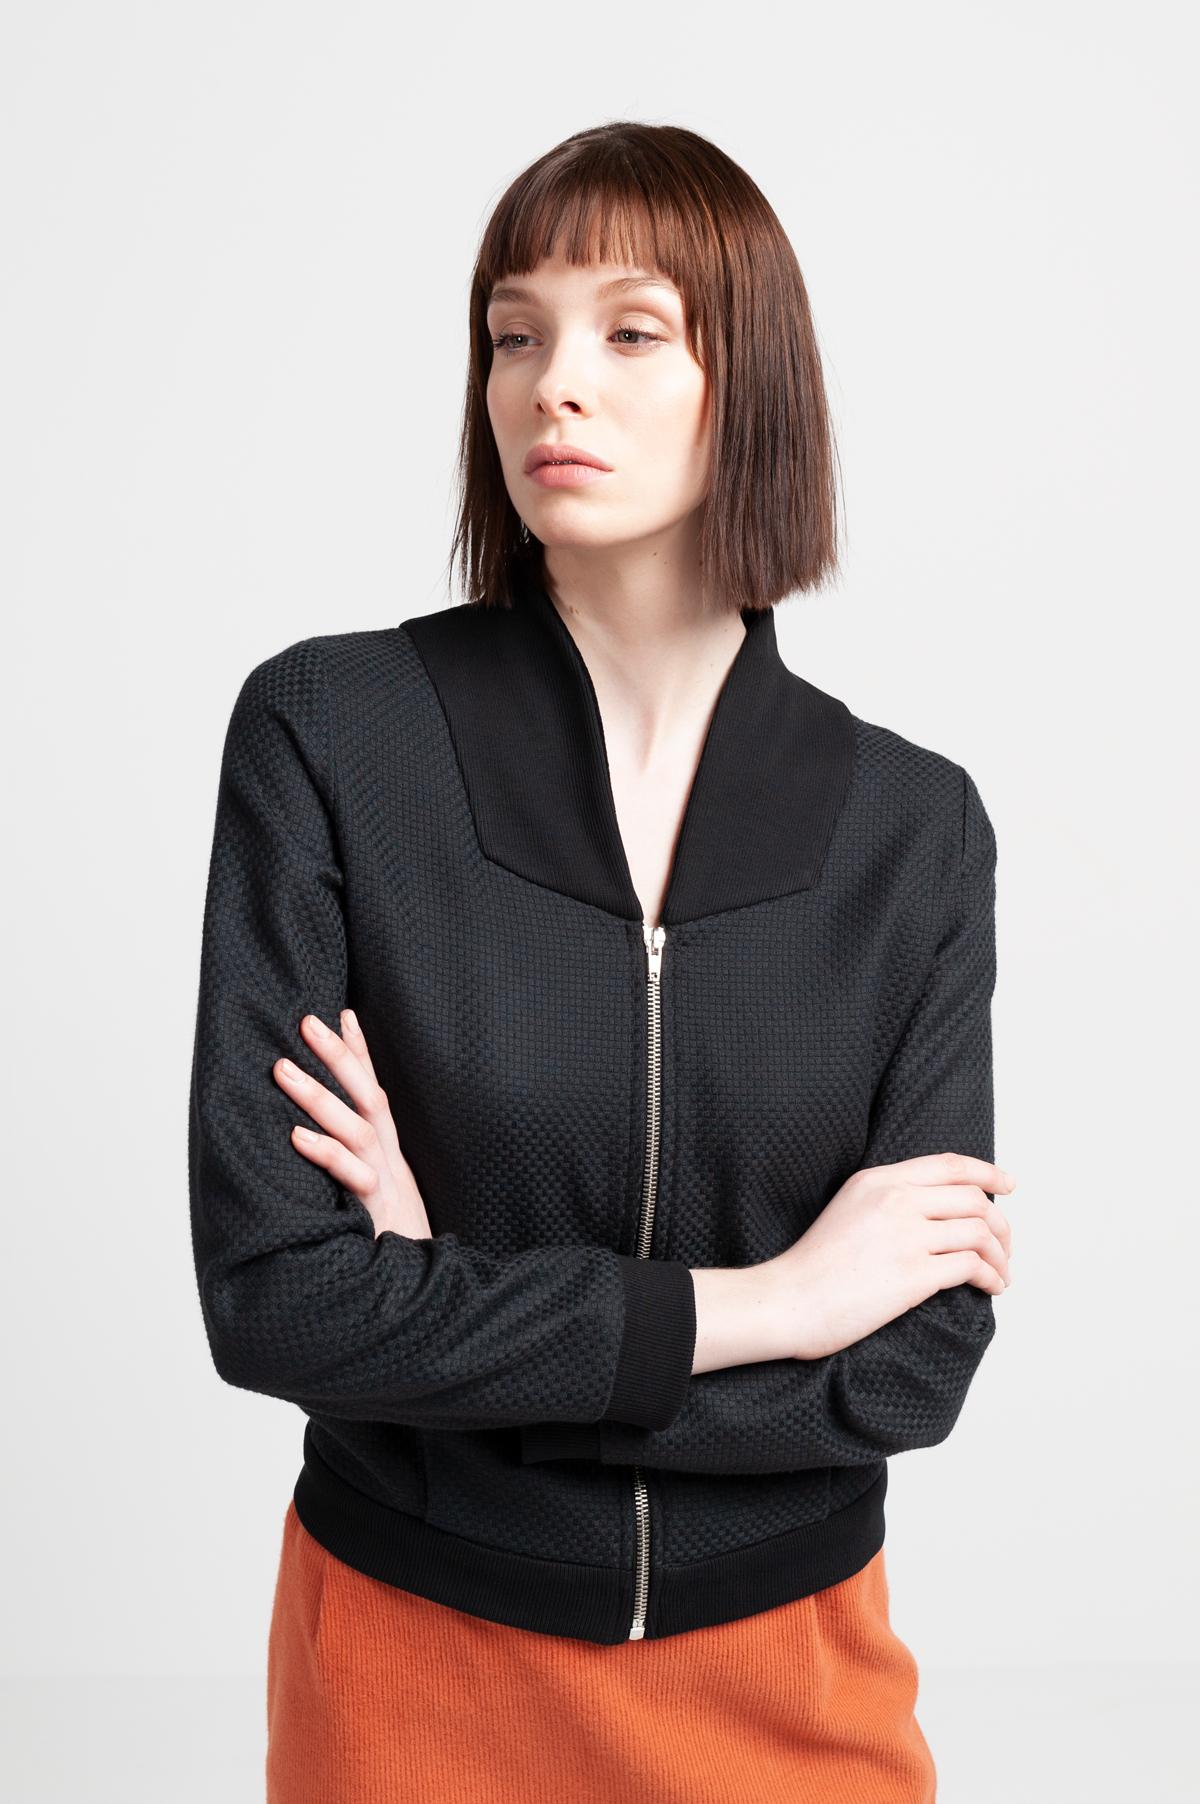 Roberta Organic Fashion Shipsheip Blouson Jill (1)